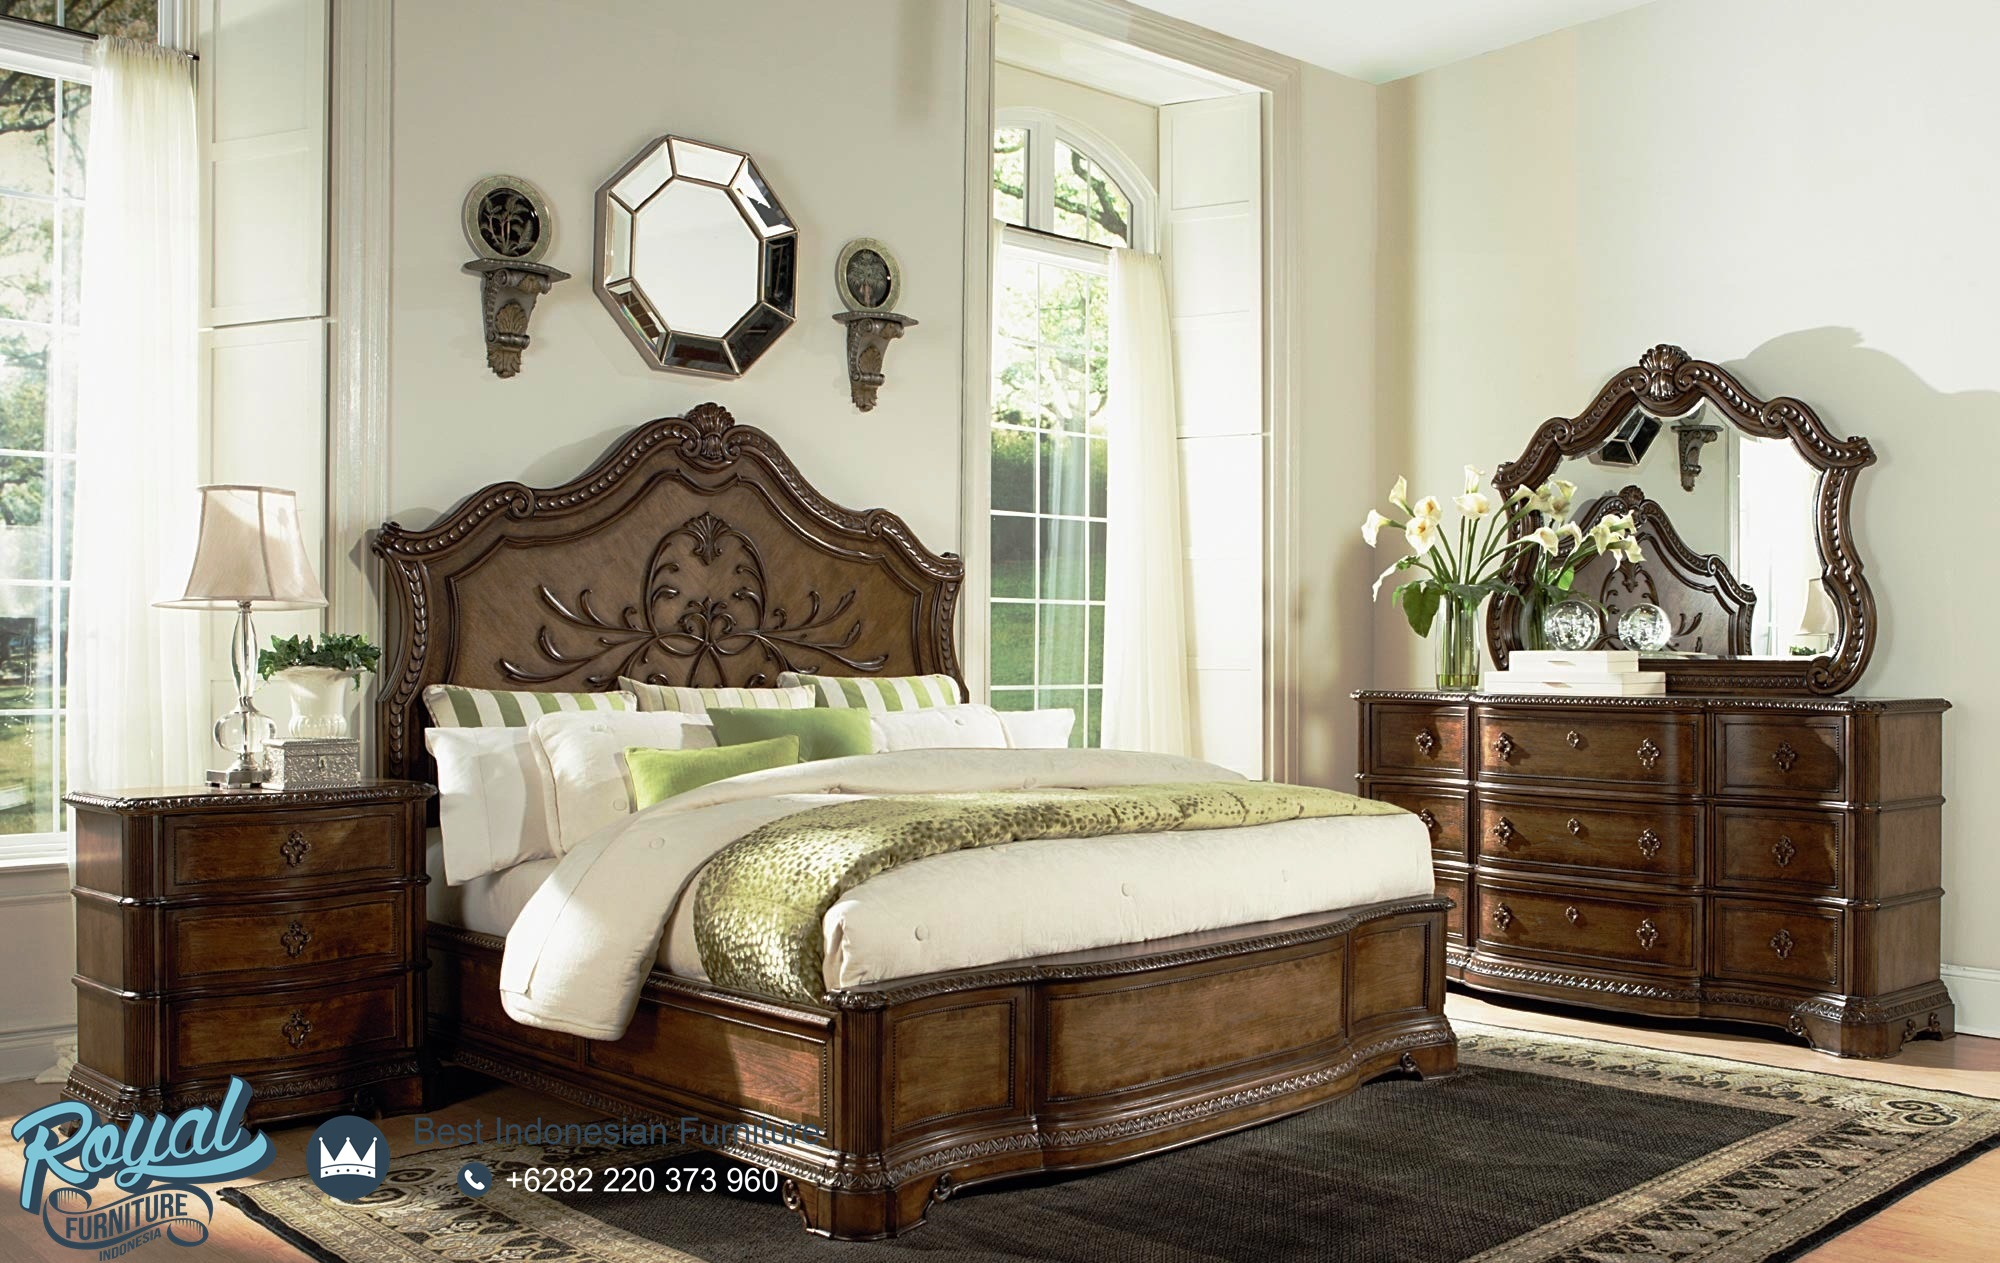 Kamar Tidur Klasik Jati Minimalis Ukiran Jepara Terbaru, set kamar tidur minimalis modern, harga tempat tidur mewah modern, kamar set jepara model terbaru, tempat tidur jepara terbaru, harga tempat tidur jati mewah, model tempat tidur minimalis dan harga, tempat tidur minimalis, harga 1 set tempat tidur pengantin, jual furniture kamar tidur klasik jepara, set kamar tidur mewah, set kamar tidur klasik mewah, kamar tidur model terbaru, gambar model tempat tidur ukir klasik jepara, desain kamar tidur mewah klasik terbaru, royal furniture